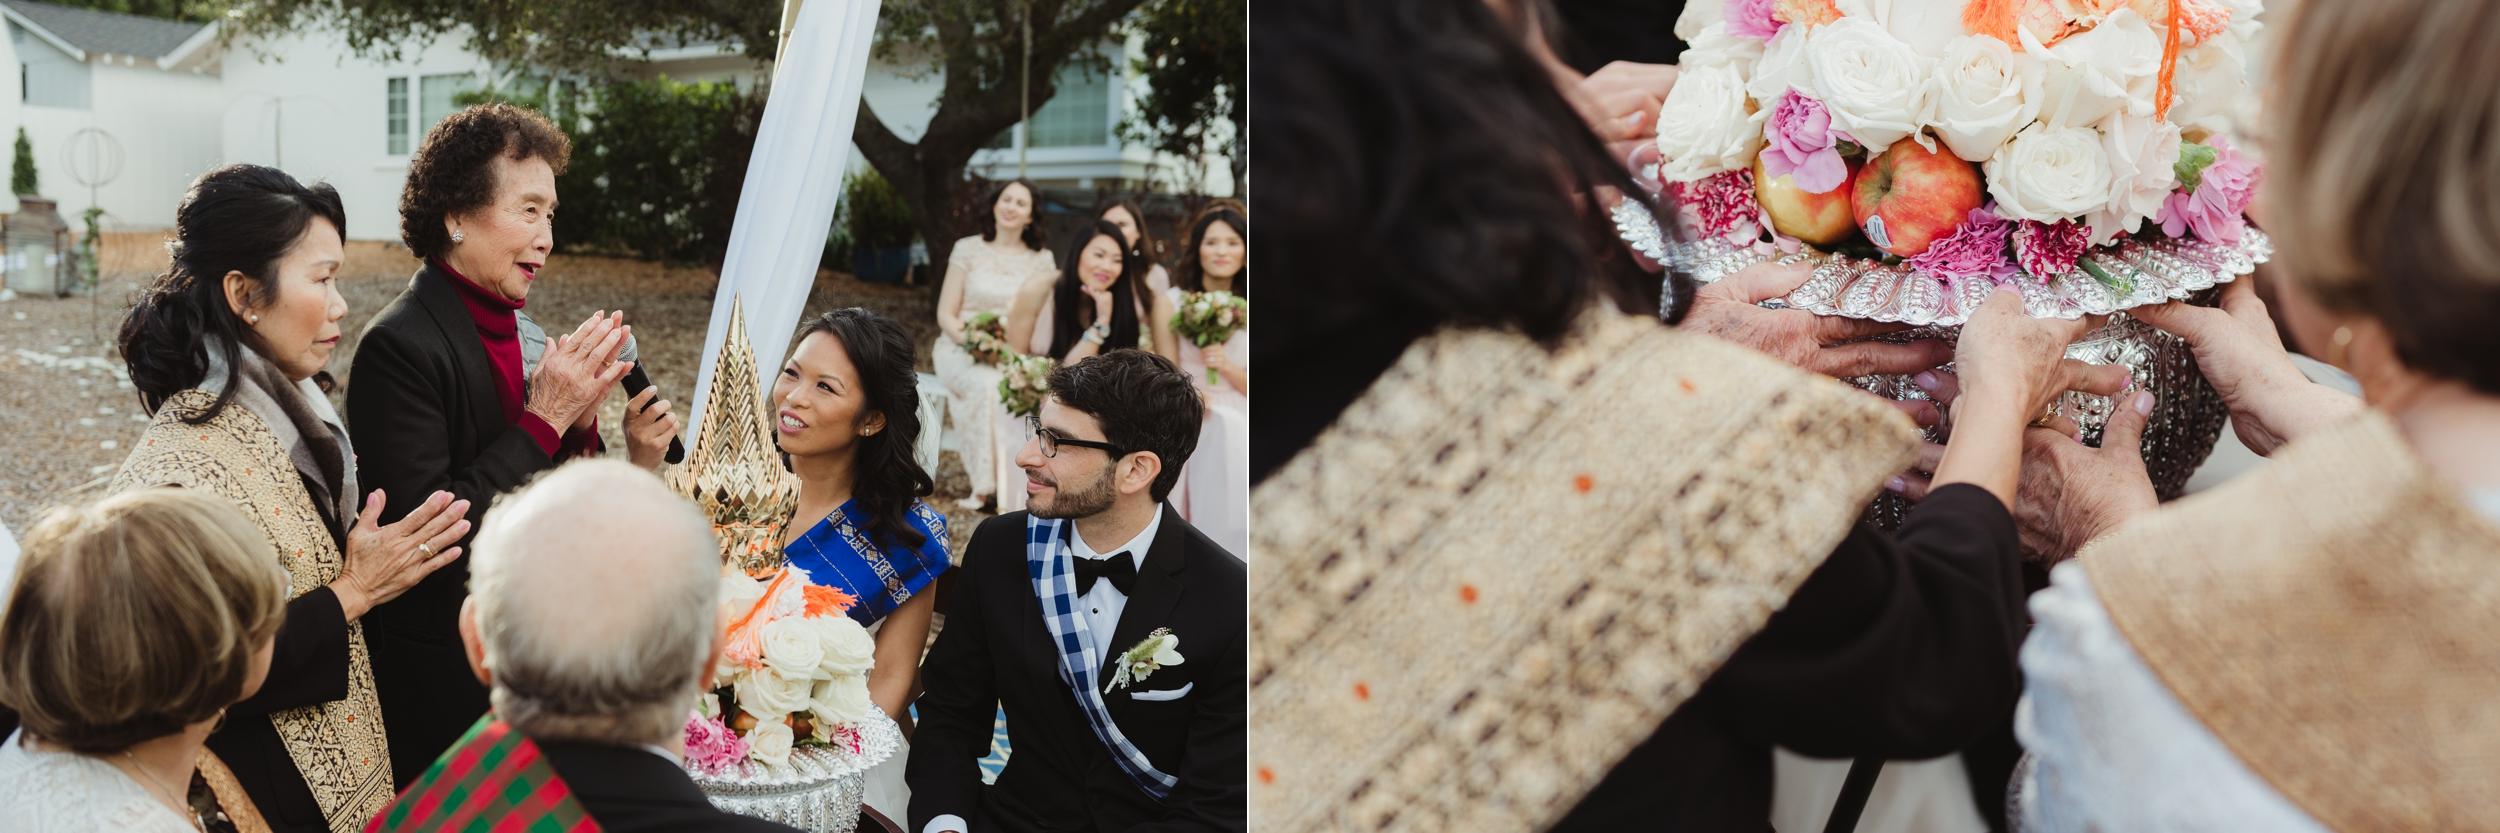 19-woodside-backyard-wedding-vivianchen-0391_WEB.jpg